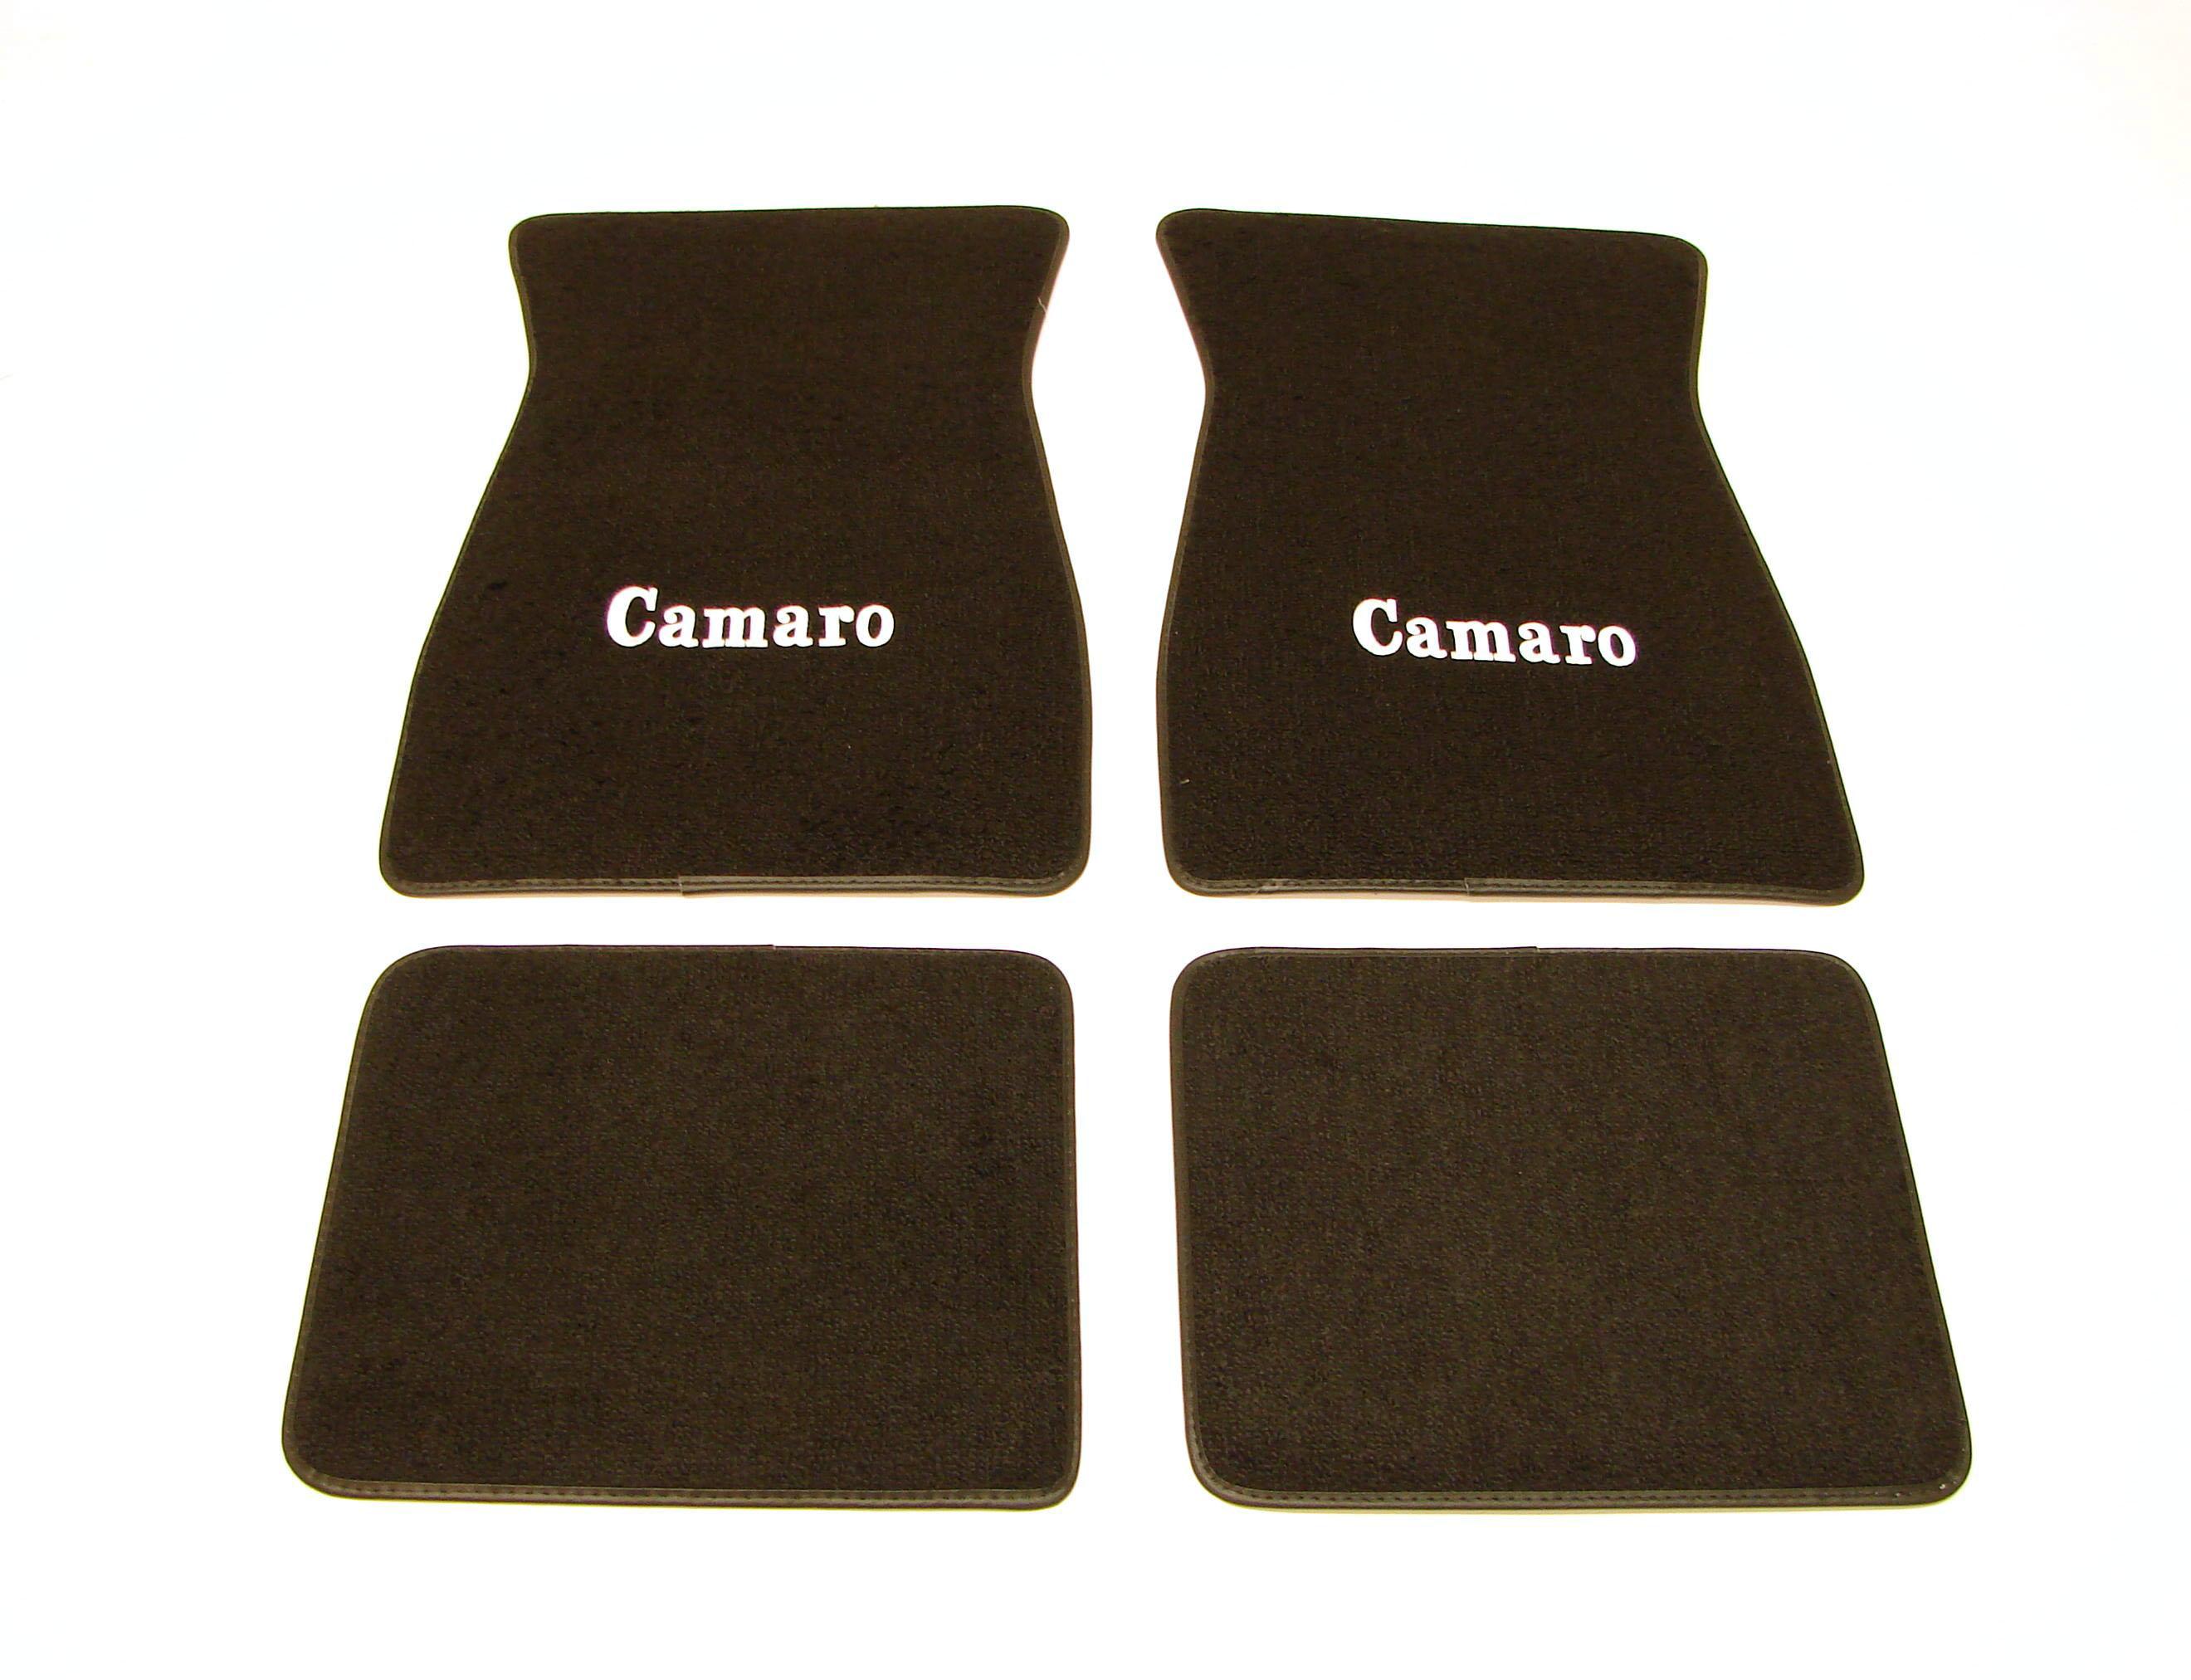 1967 1968 1969 camaro floor mats w camaro logo black ebay for 1967 camaro floor mats